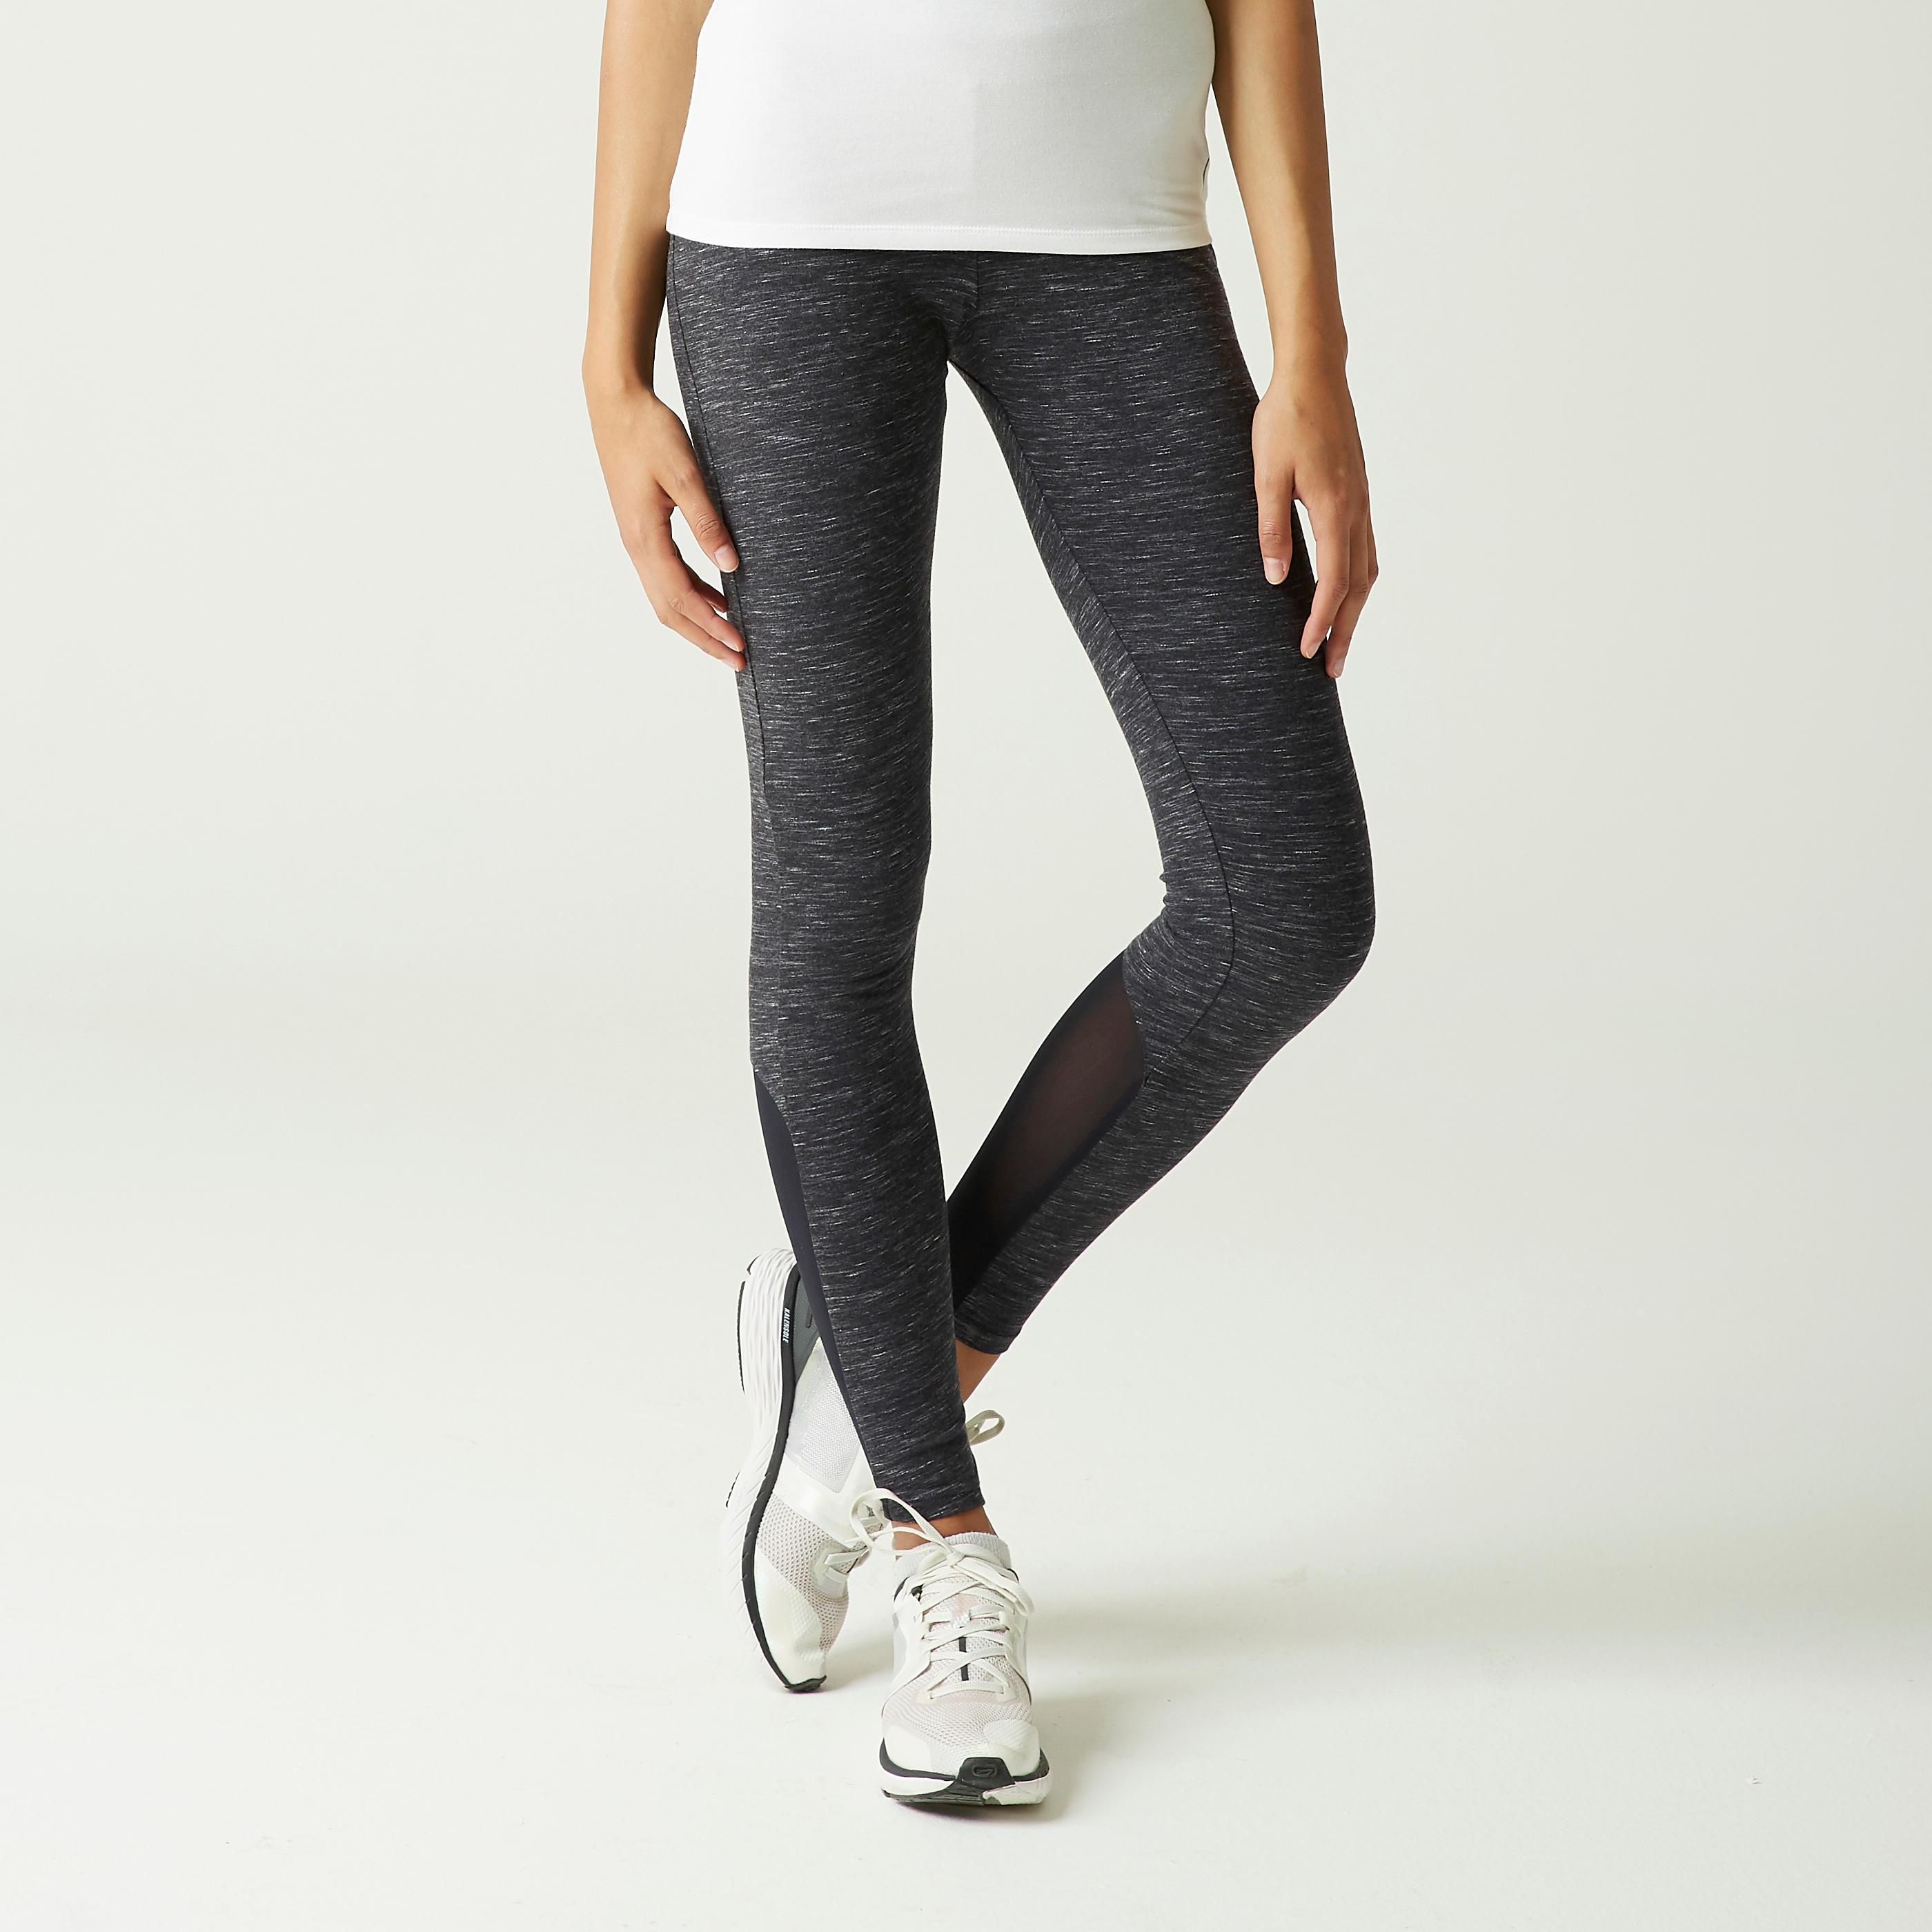 Legging de Sport 520 Femme NYAMBA | Decathlon